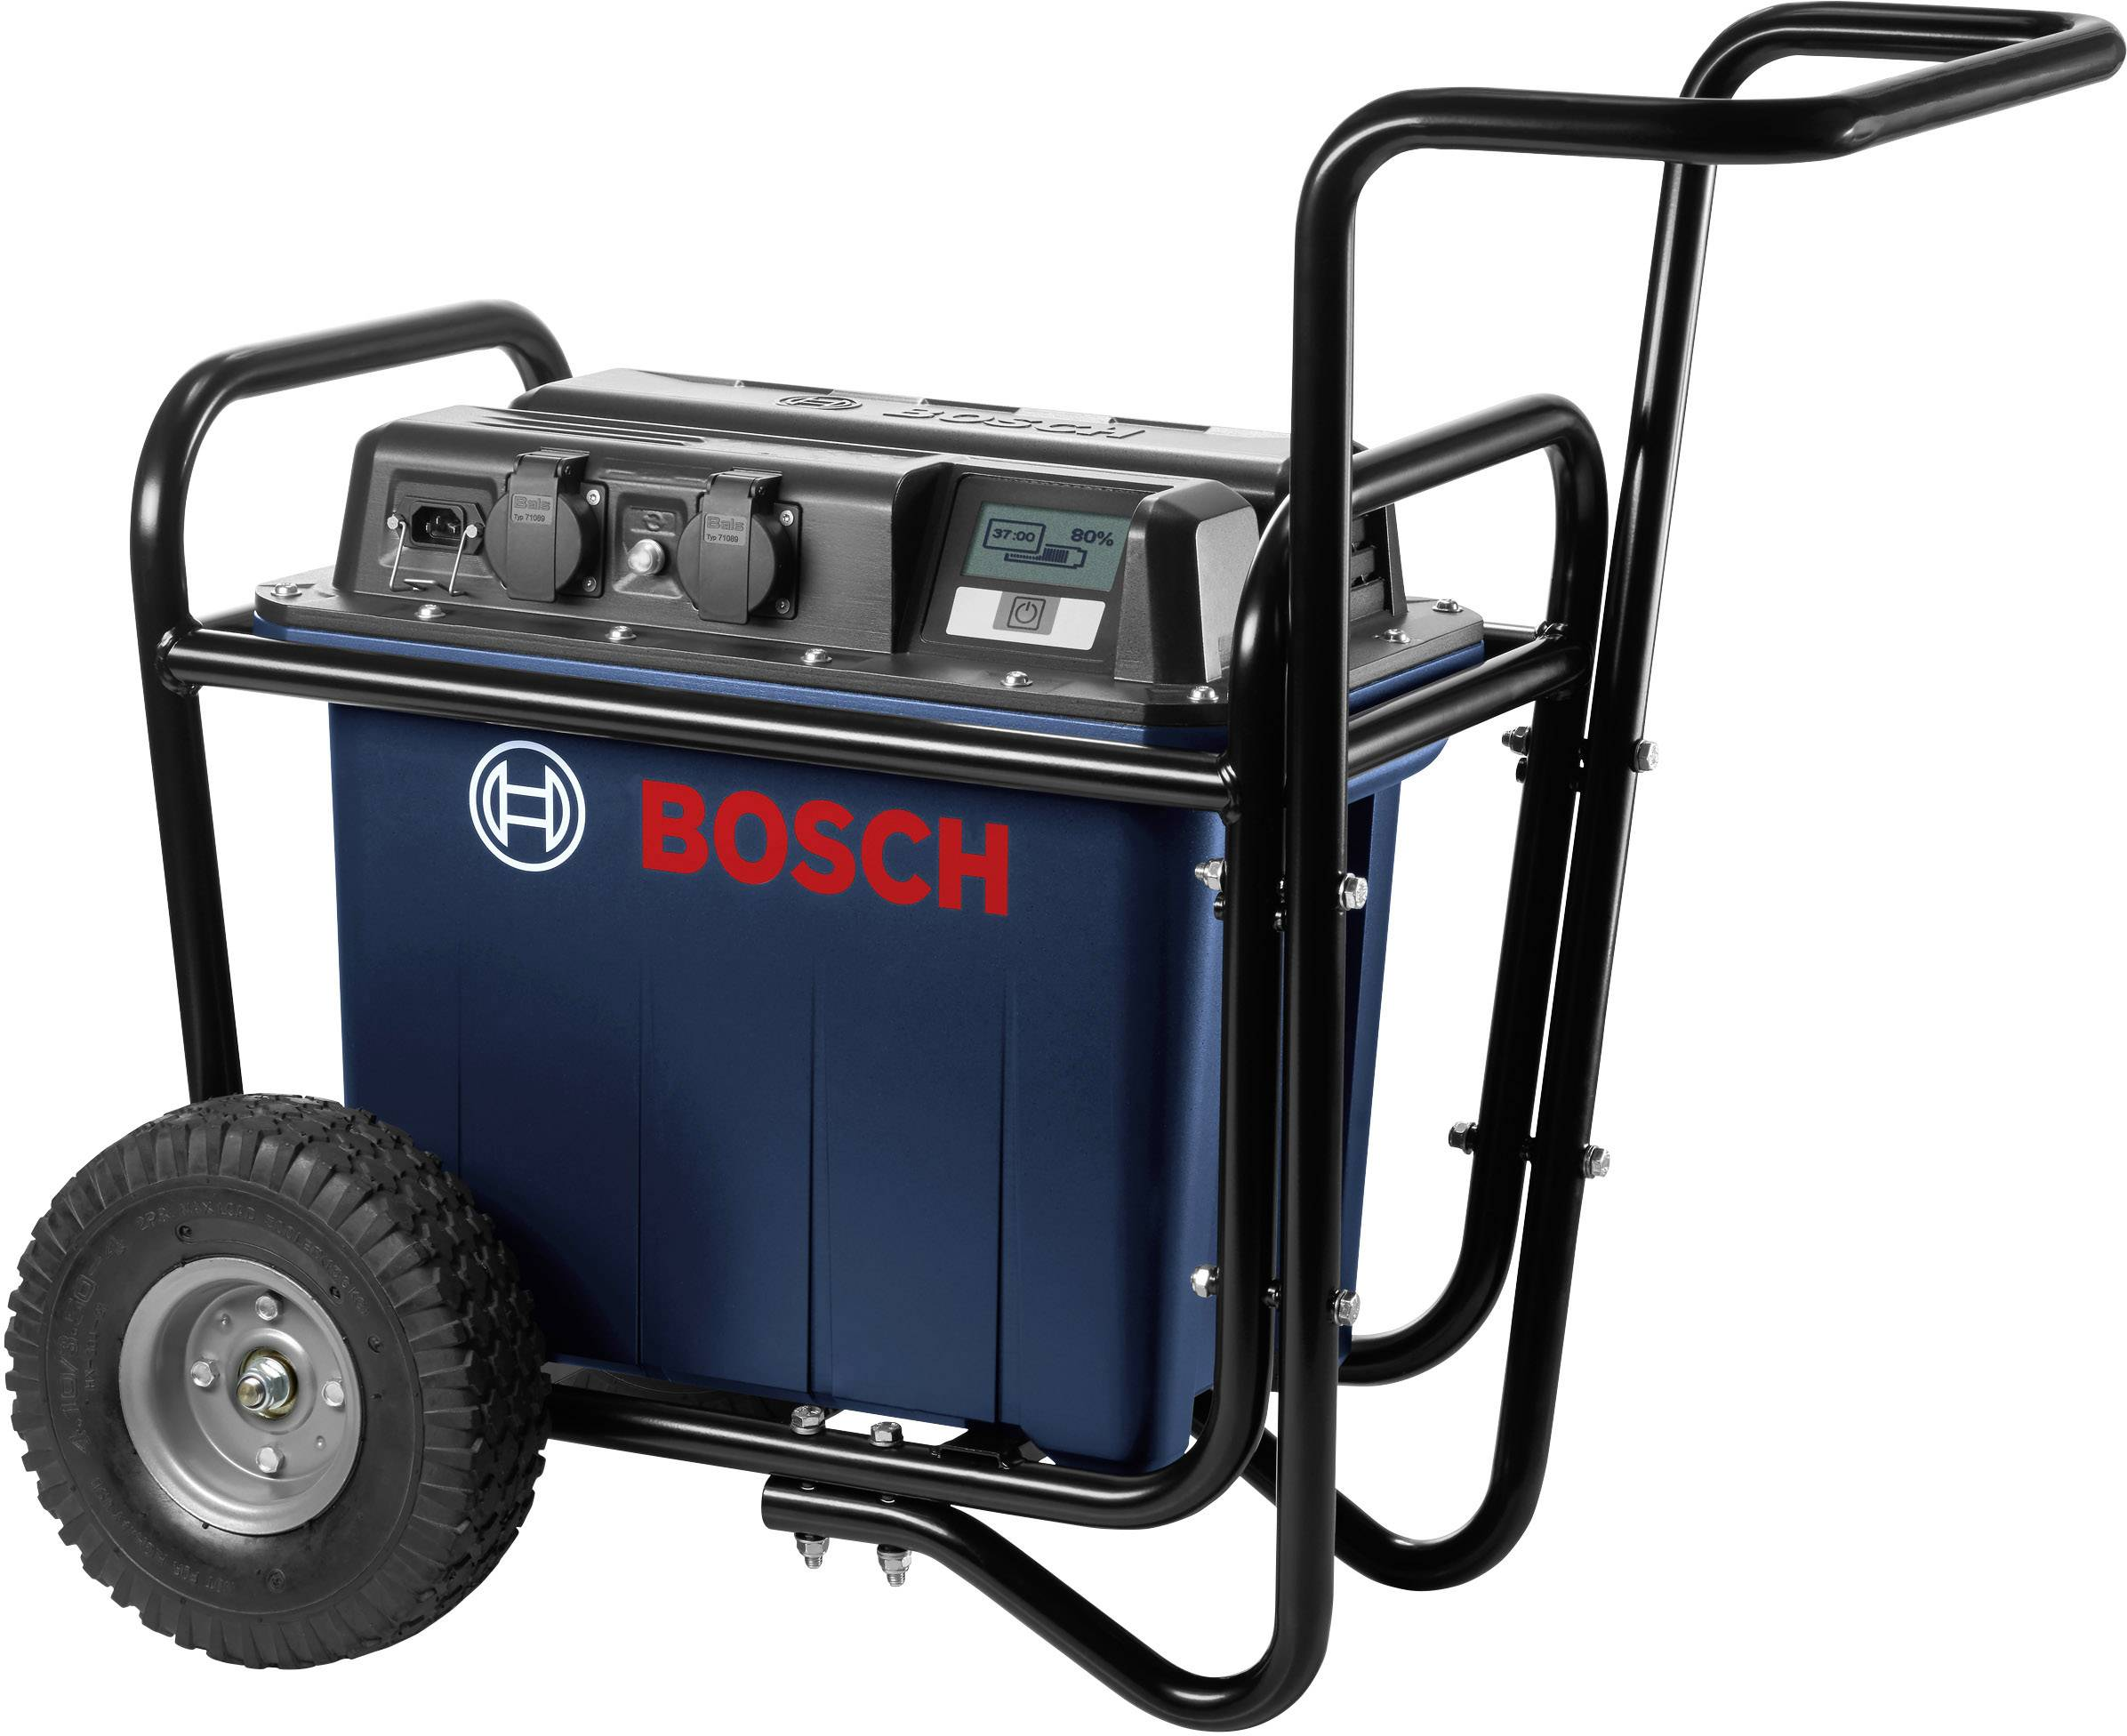 Bosch Professional F016800464